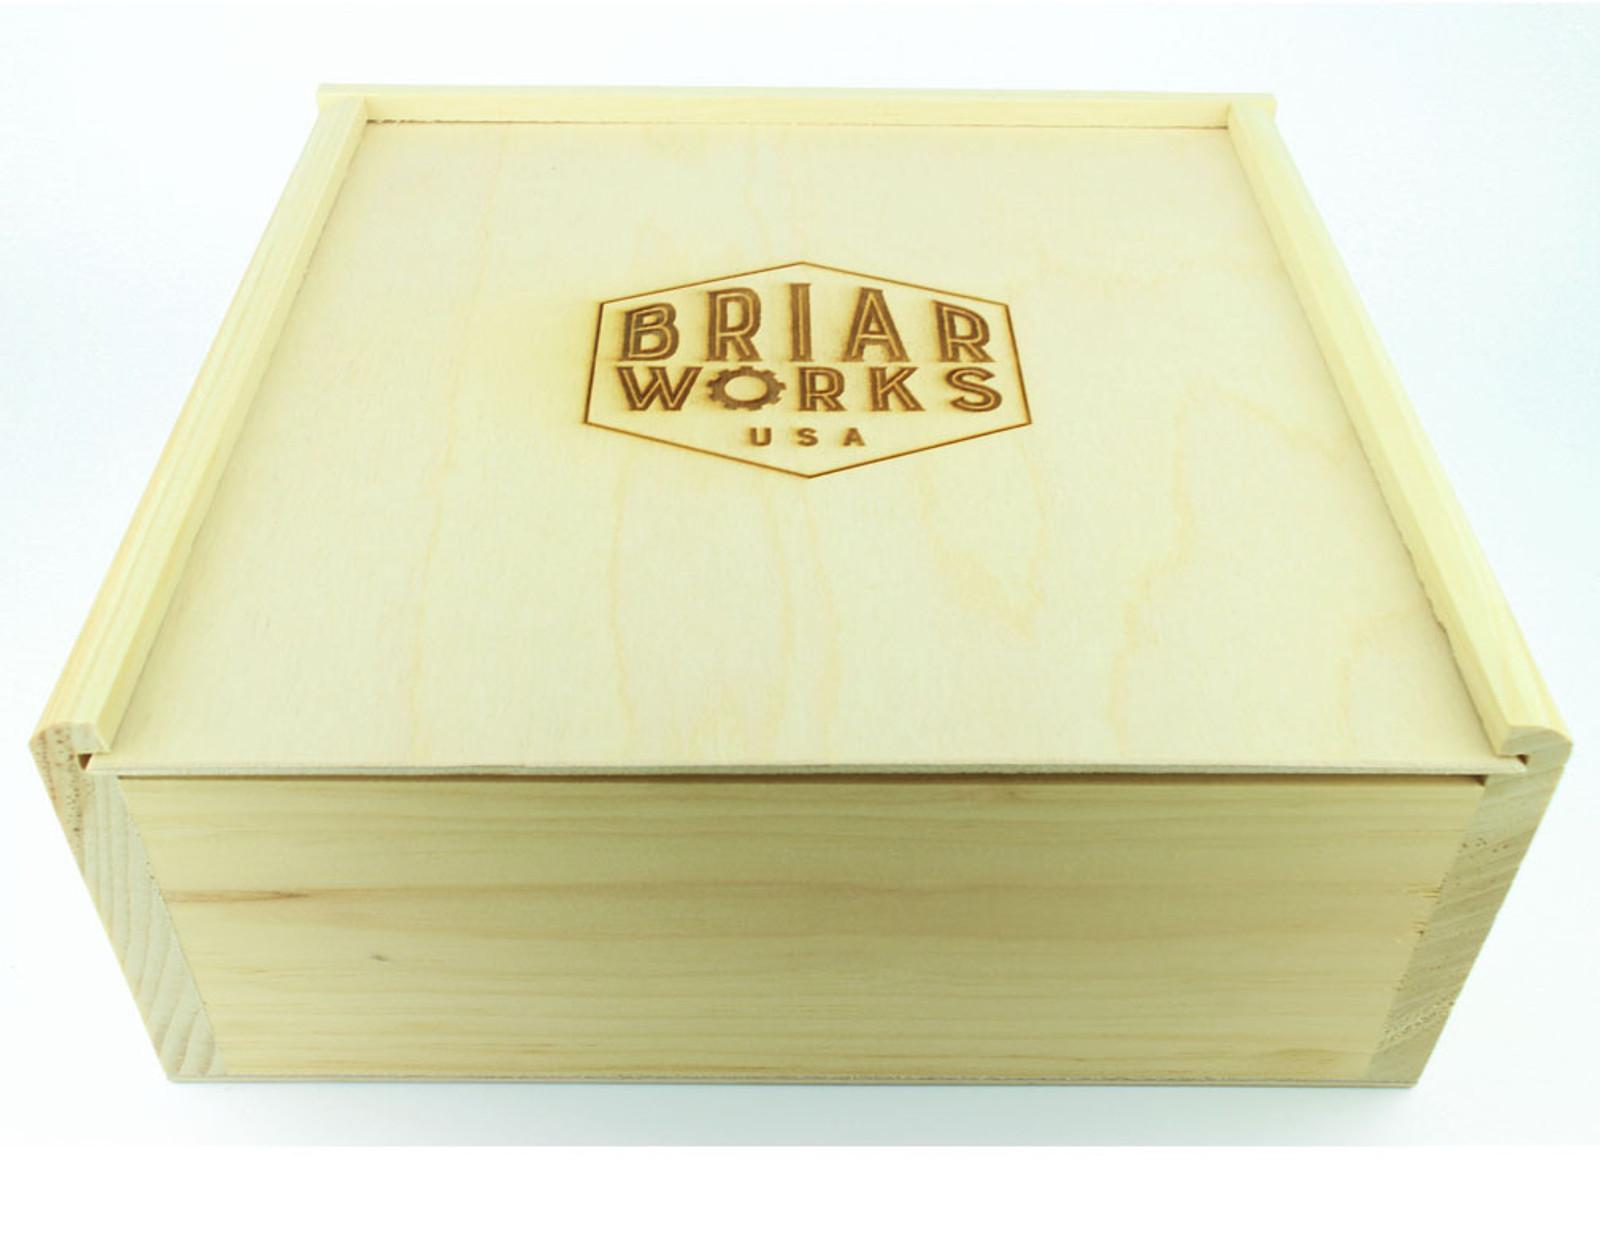 BriarWorks Unsweet Tea Gift Box